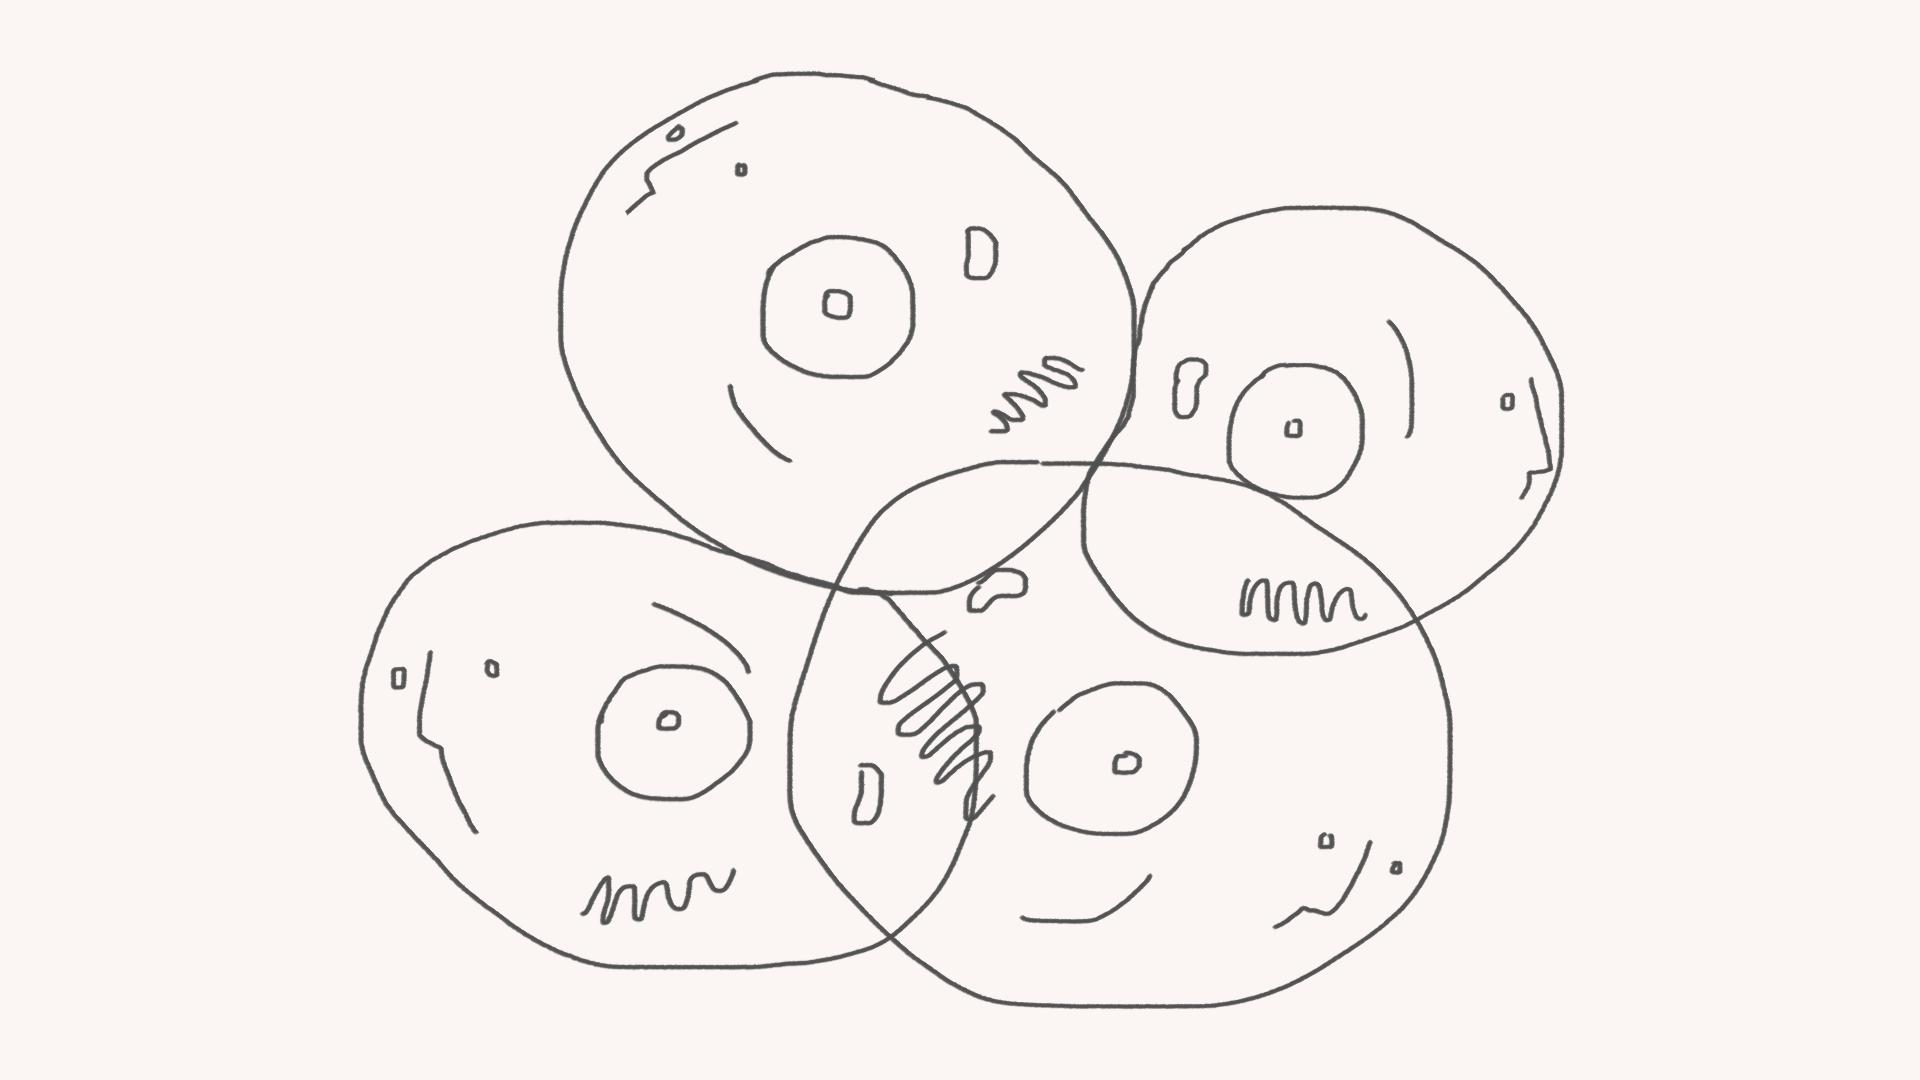 Sketch_005.png